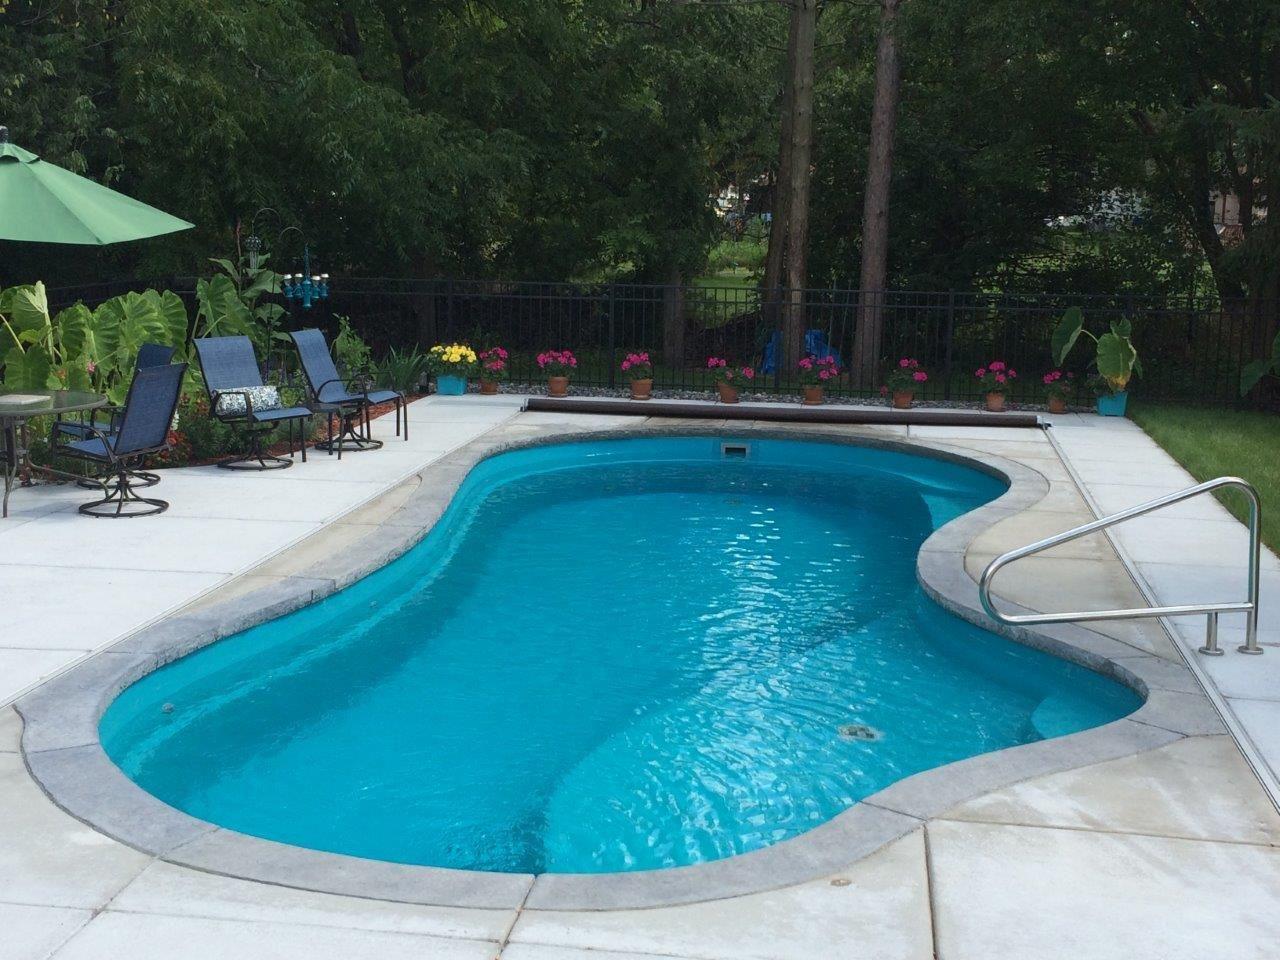 Imagine Pools The Inspiration Fiberglass Swimming Pools Fiberglass Pools Pool